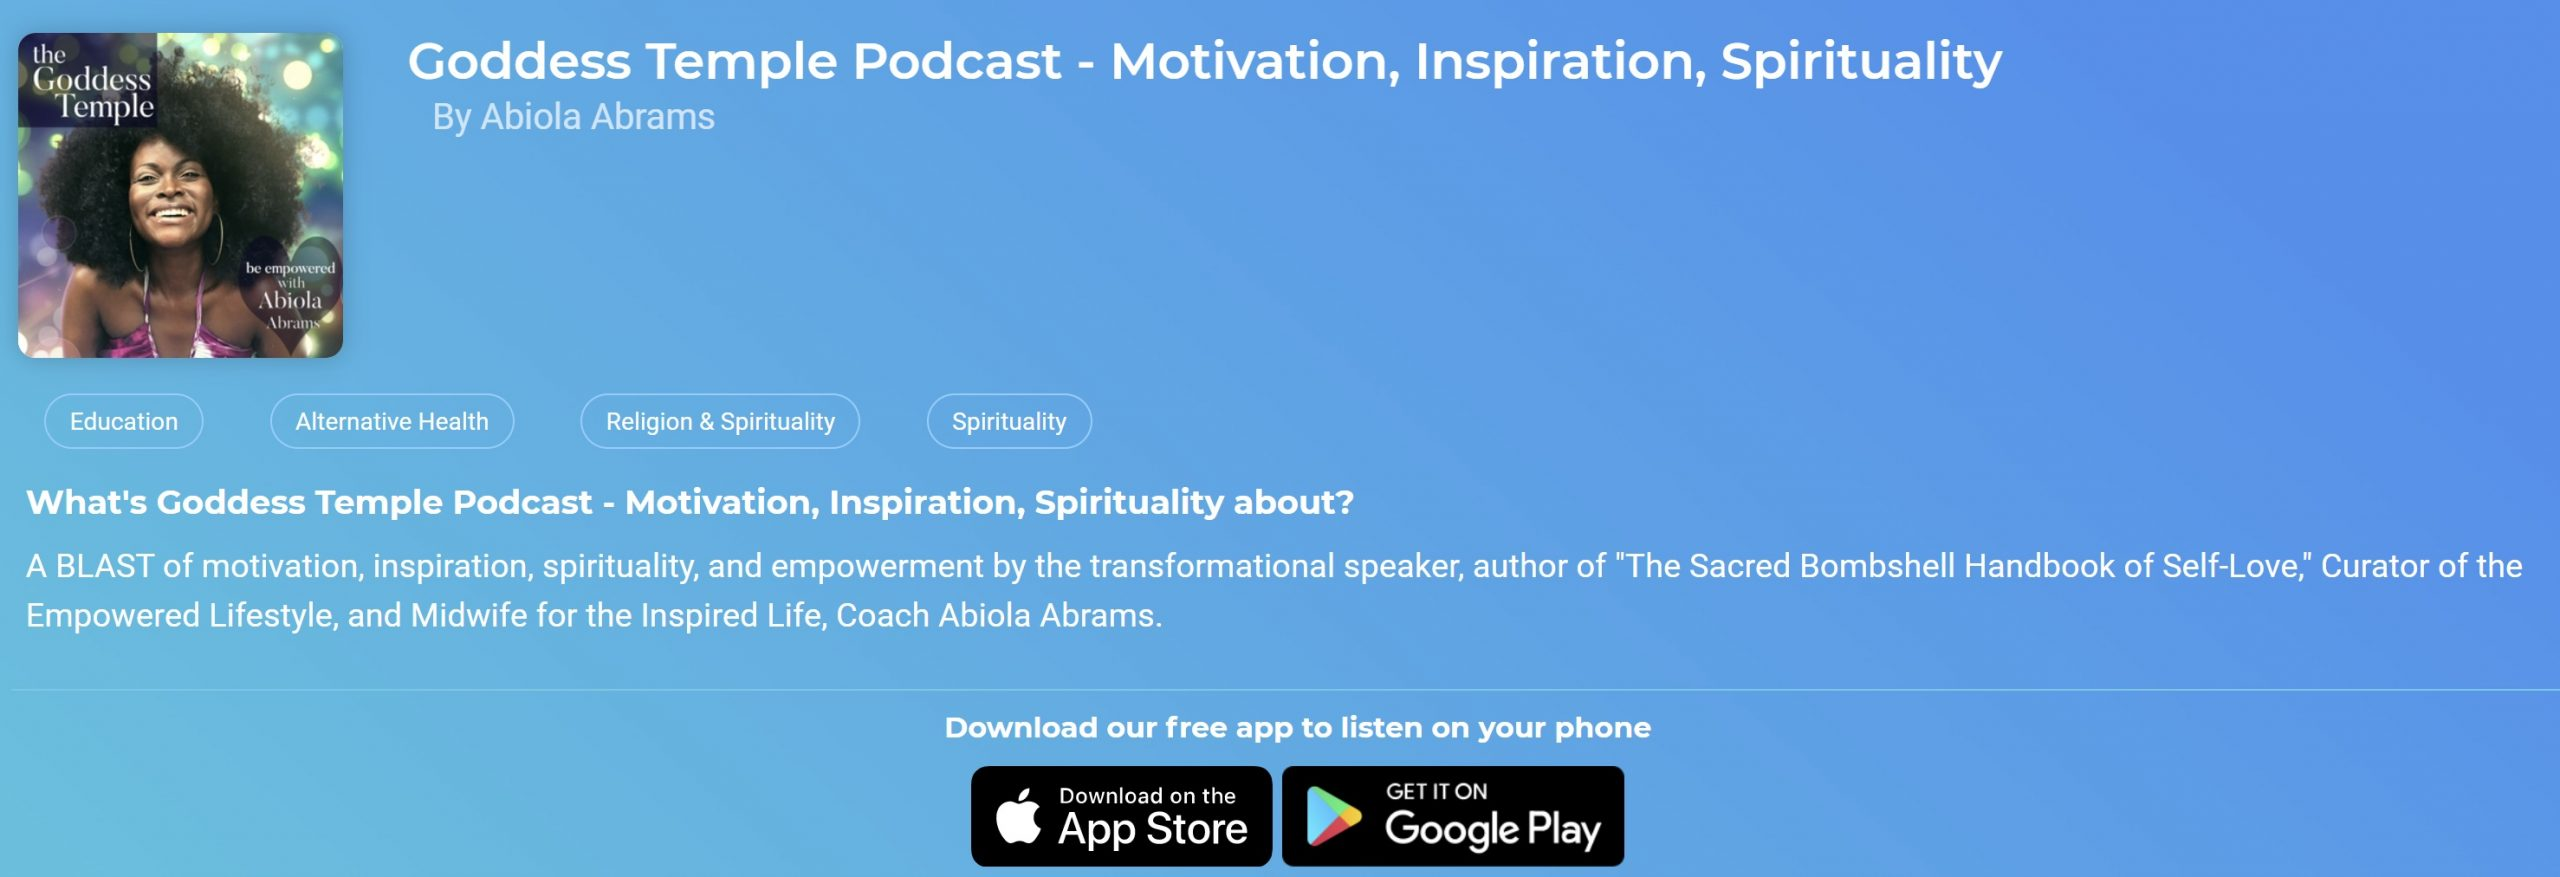 Spiritual Podcast for Women